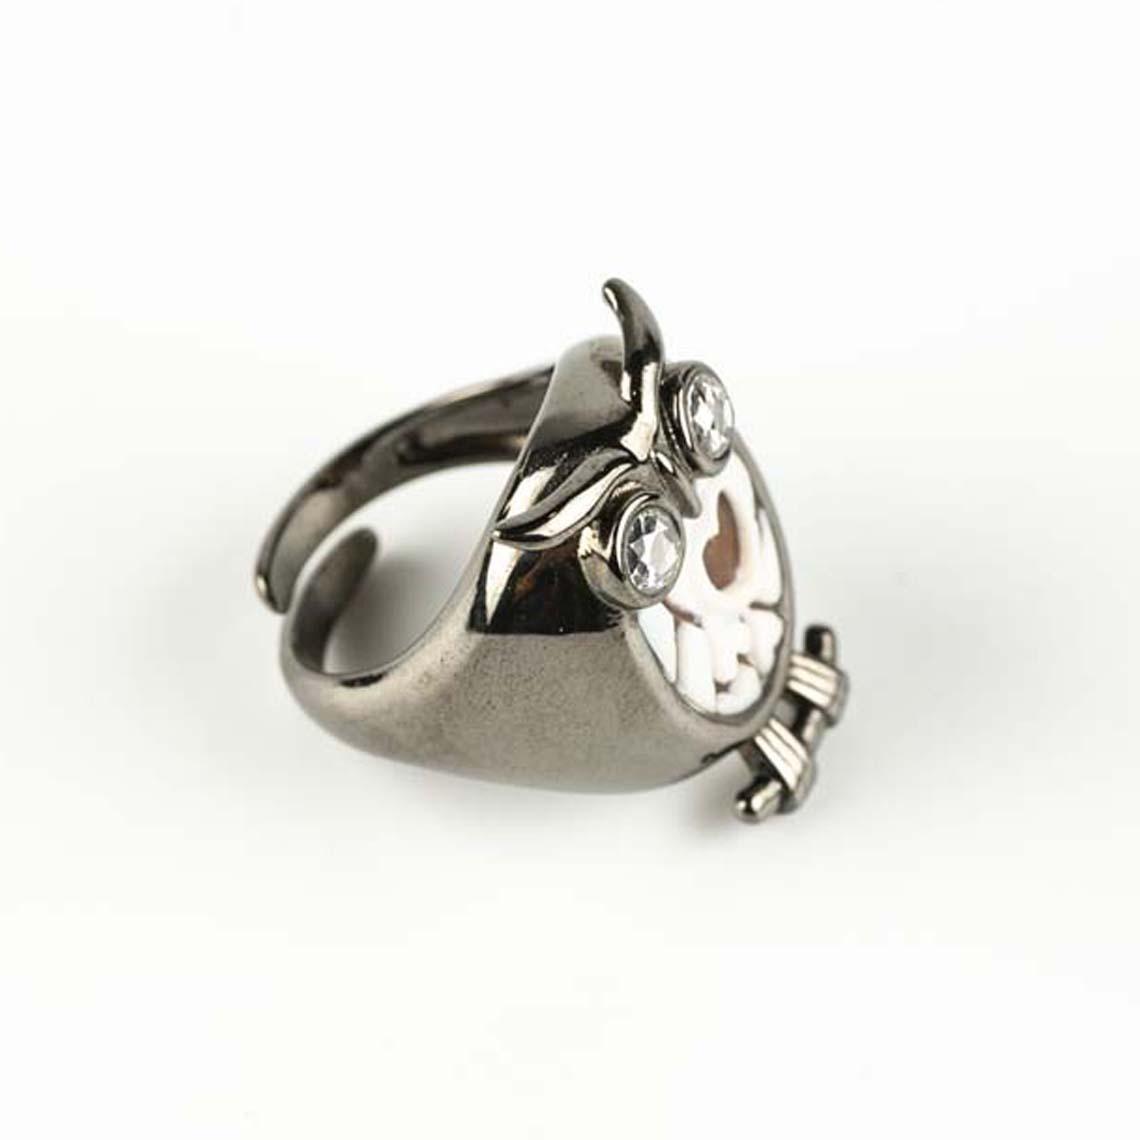 Italian cameo ring